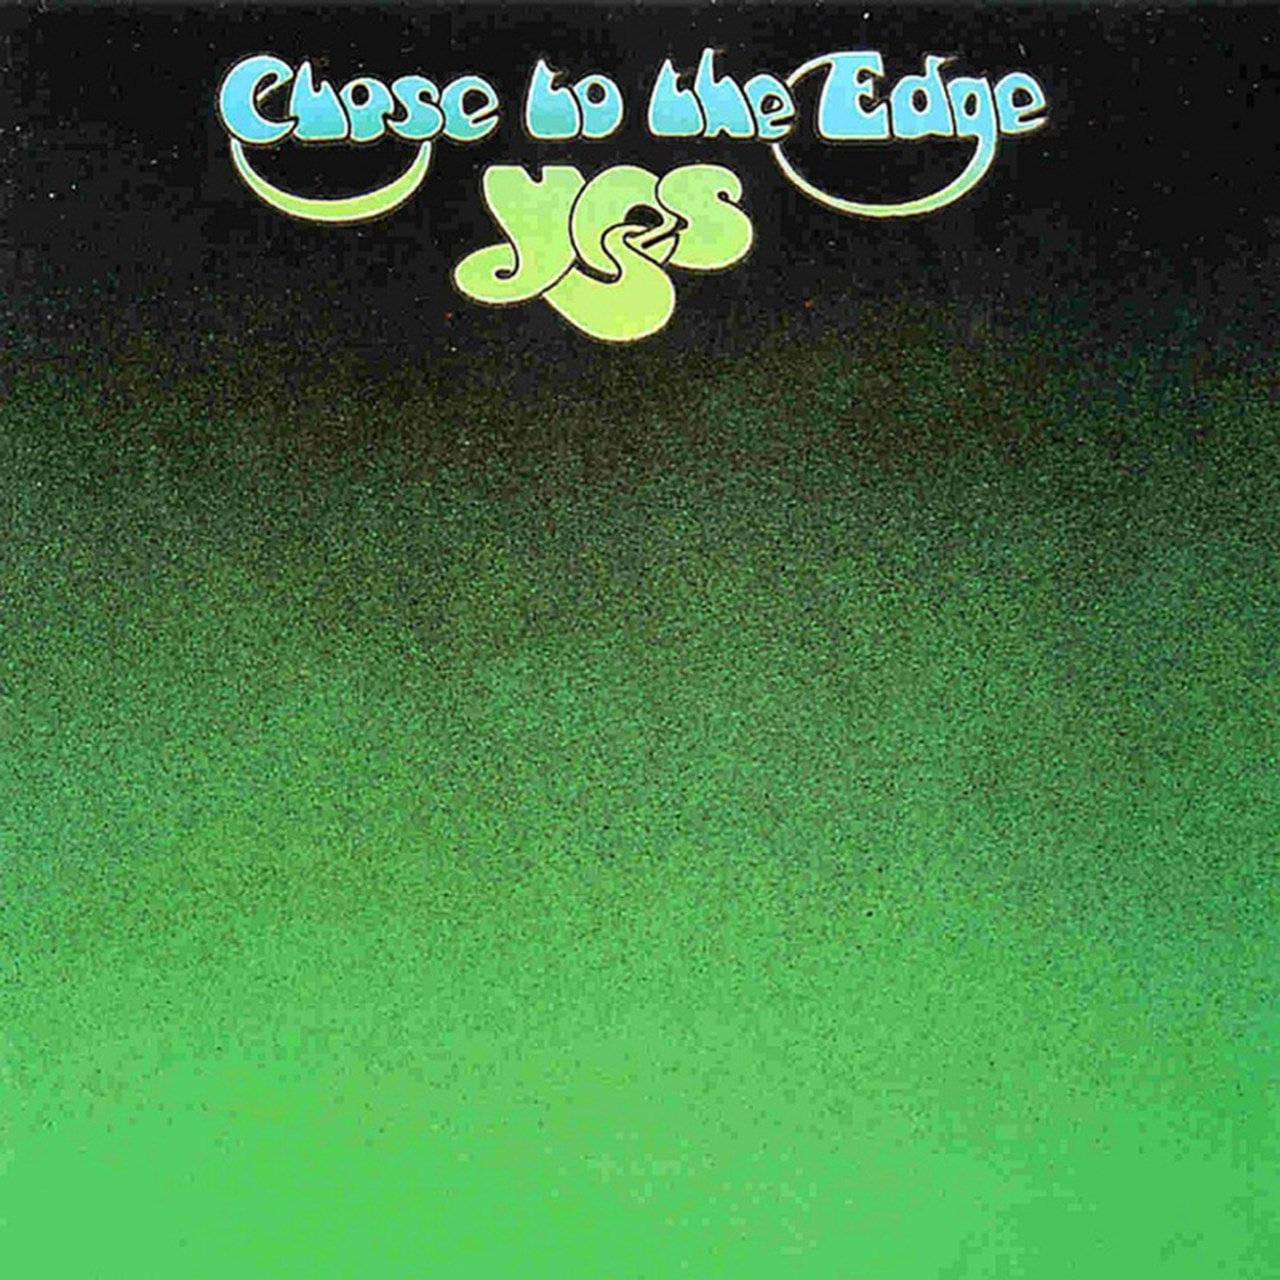 Close to the Edge - 1